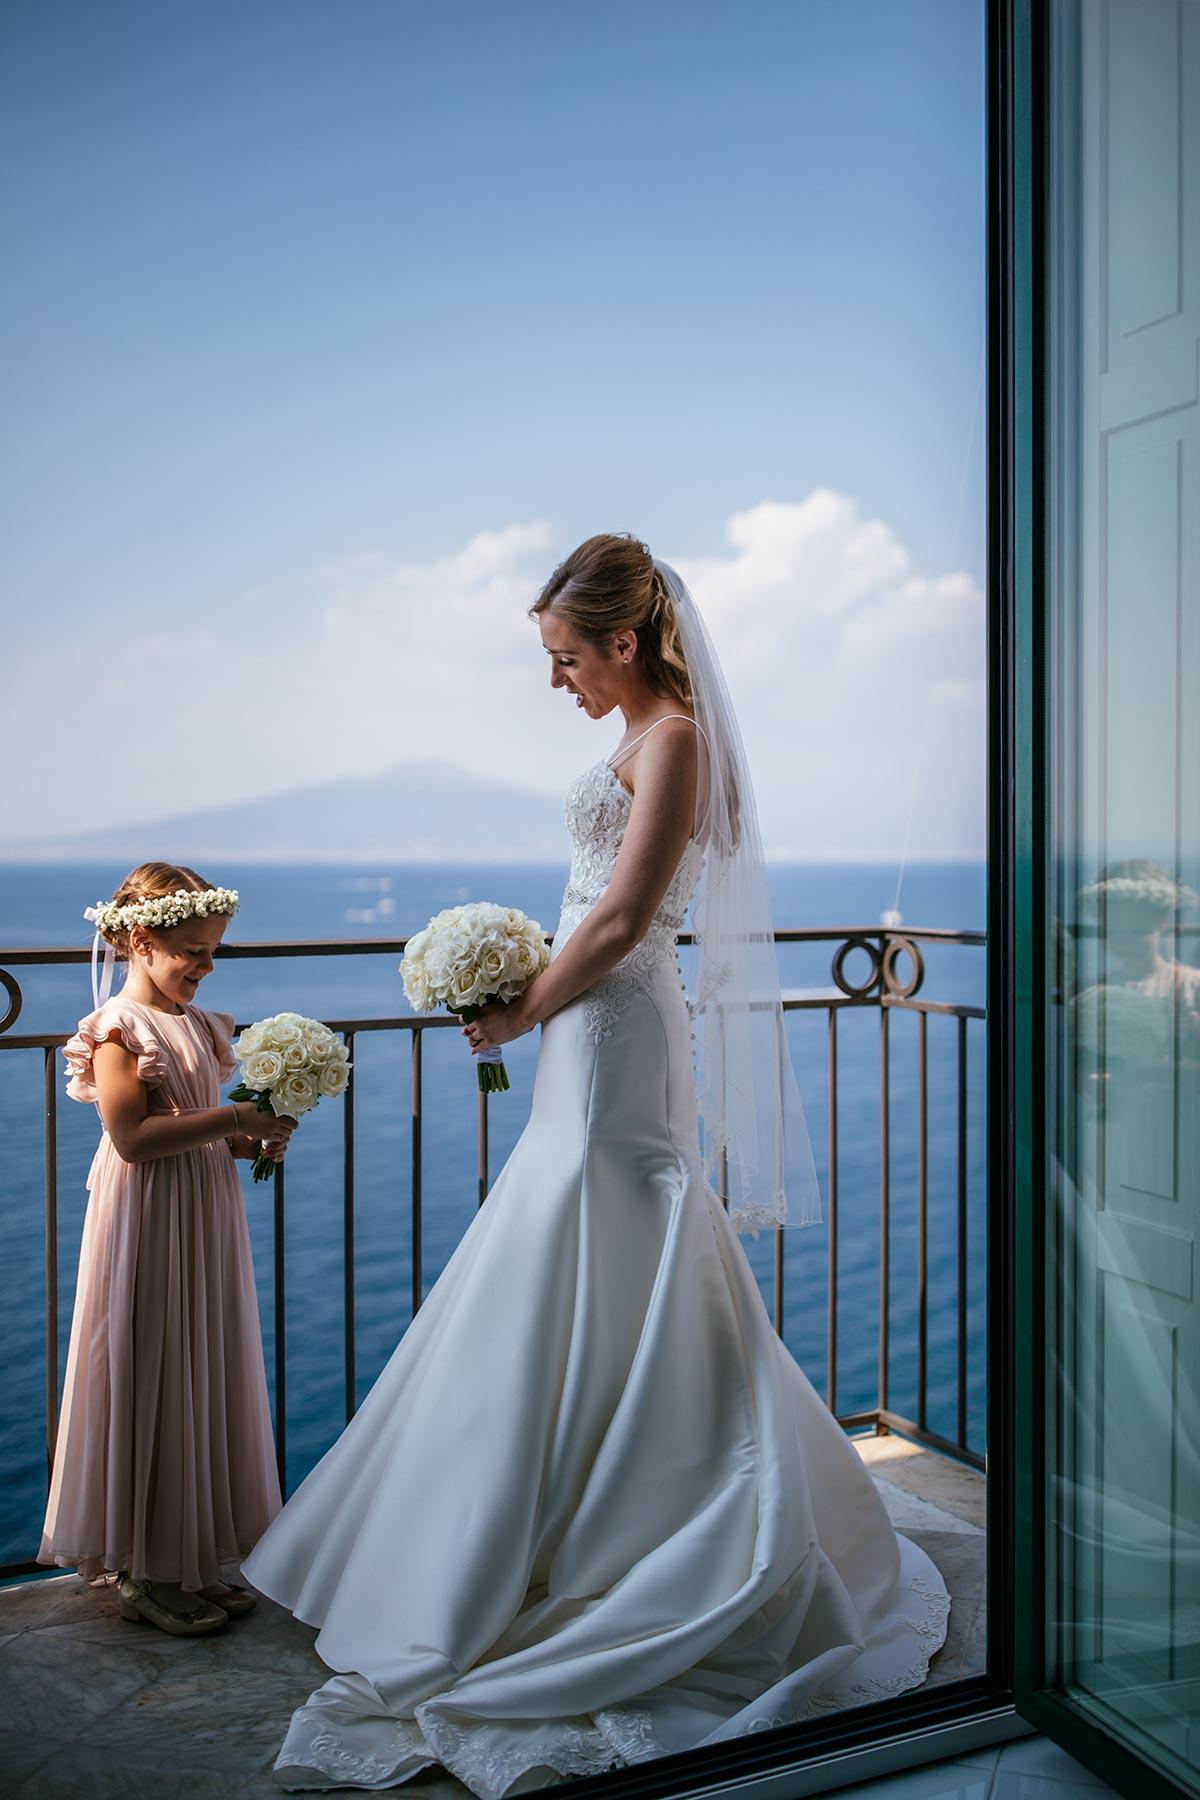 Stephen-and-Catherine-wedding-photographer-Sorrento-Bellevue-Syrene